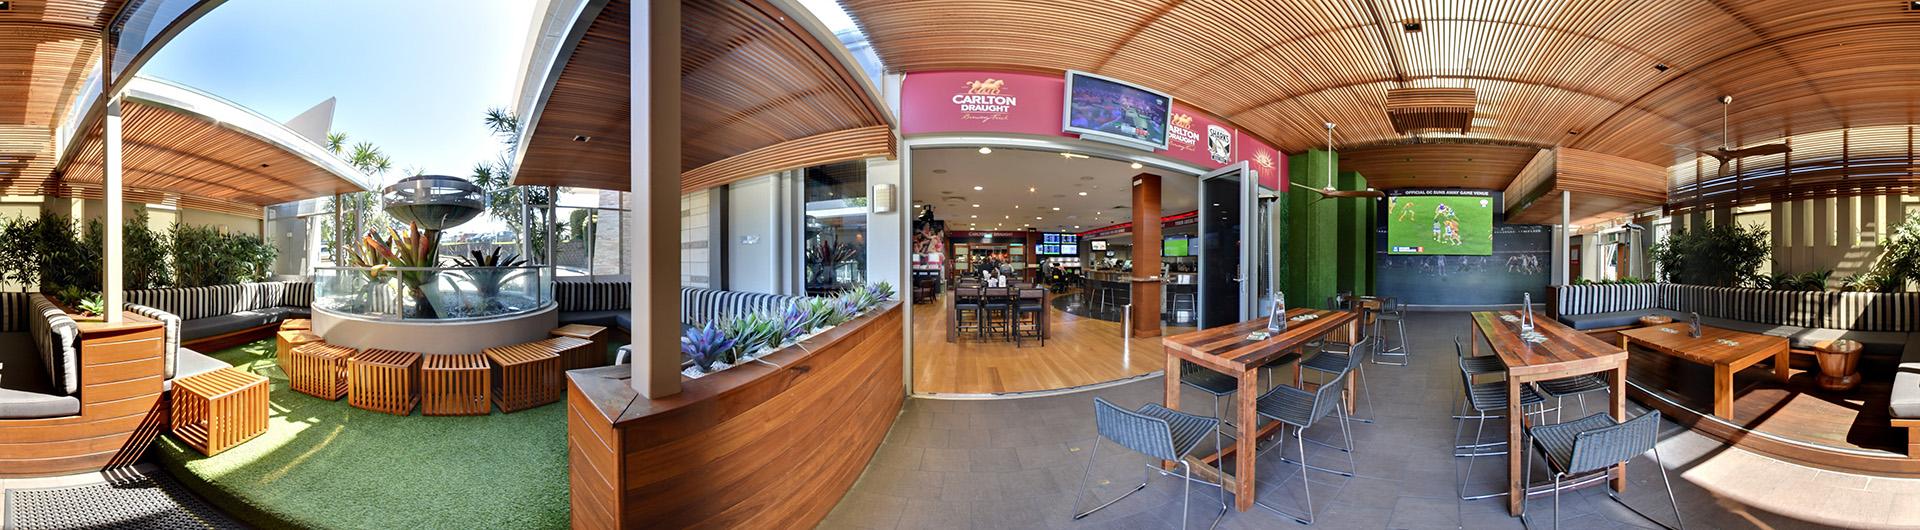 Mackenzie's Sports Bar